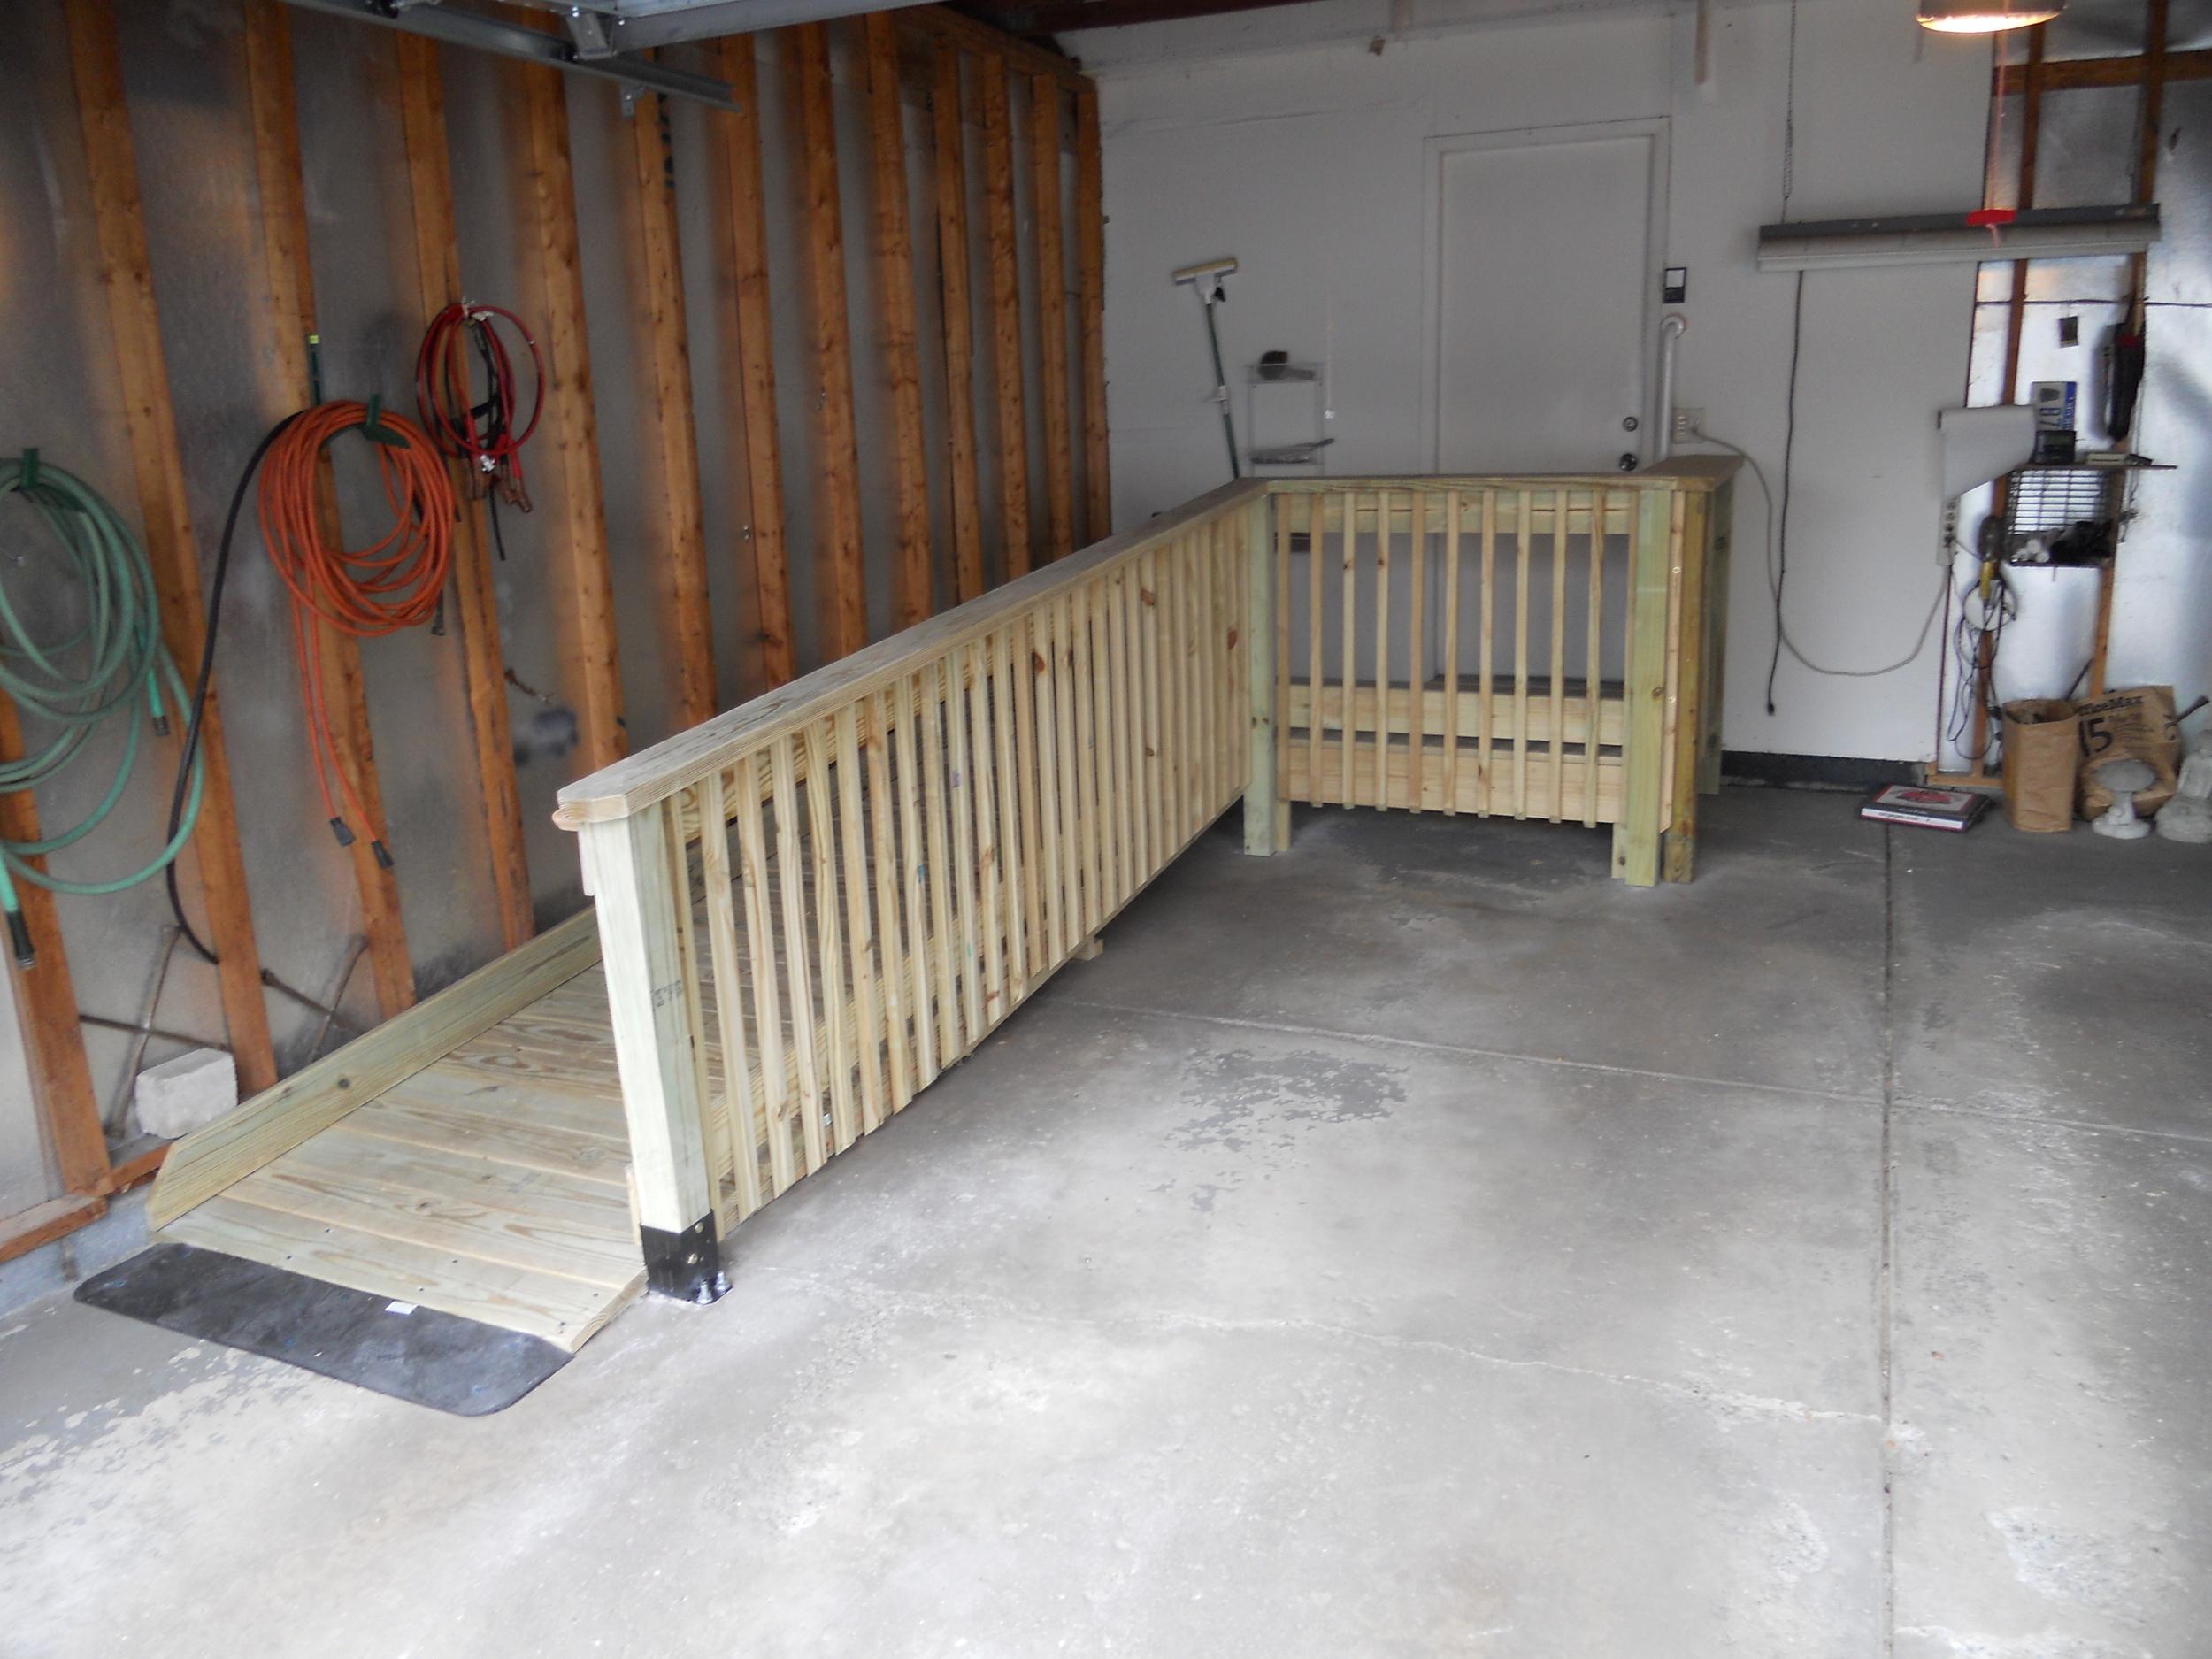 Wood Ramp in Garage